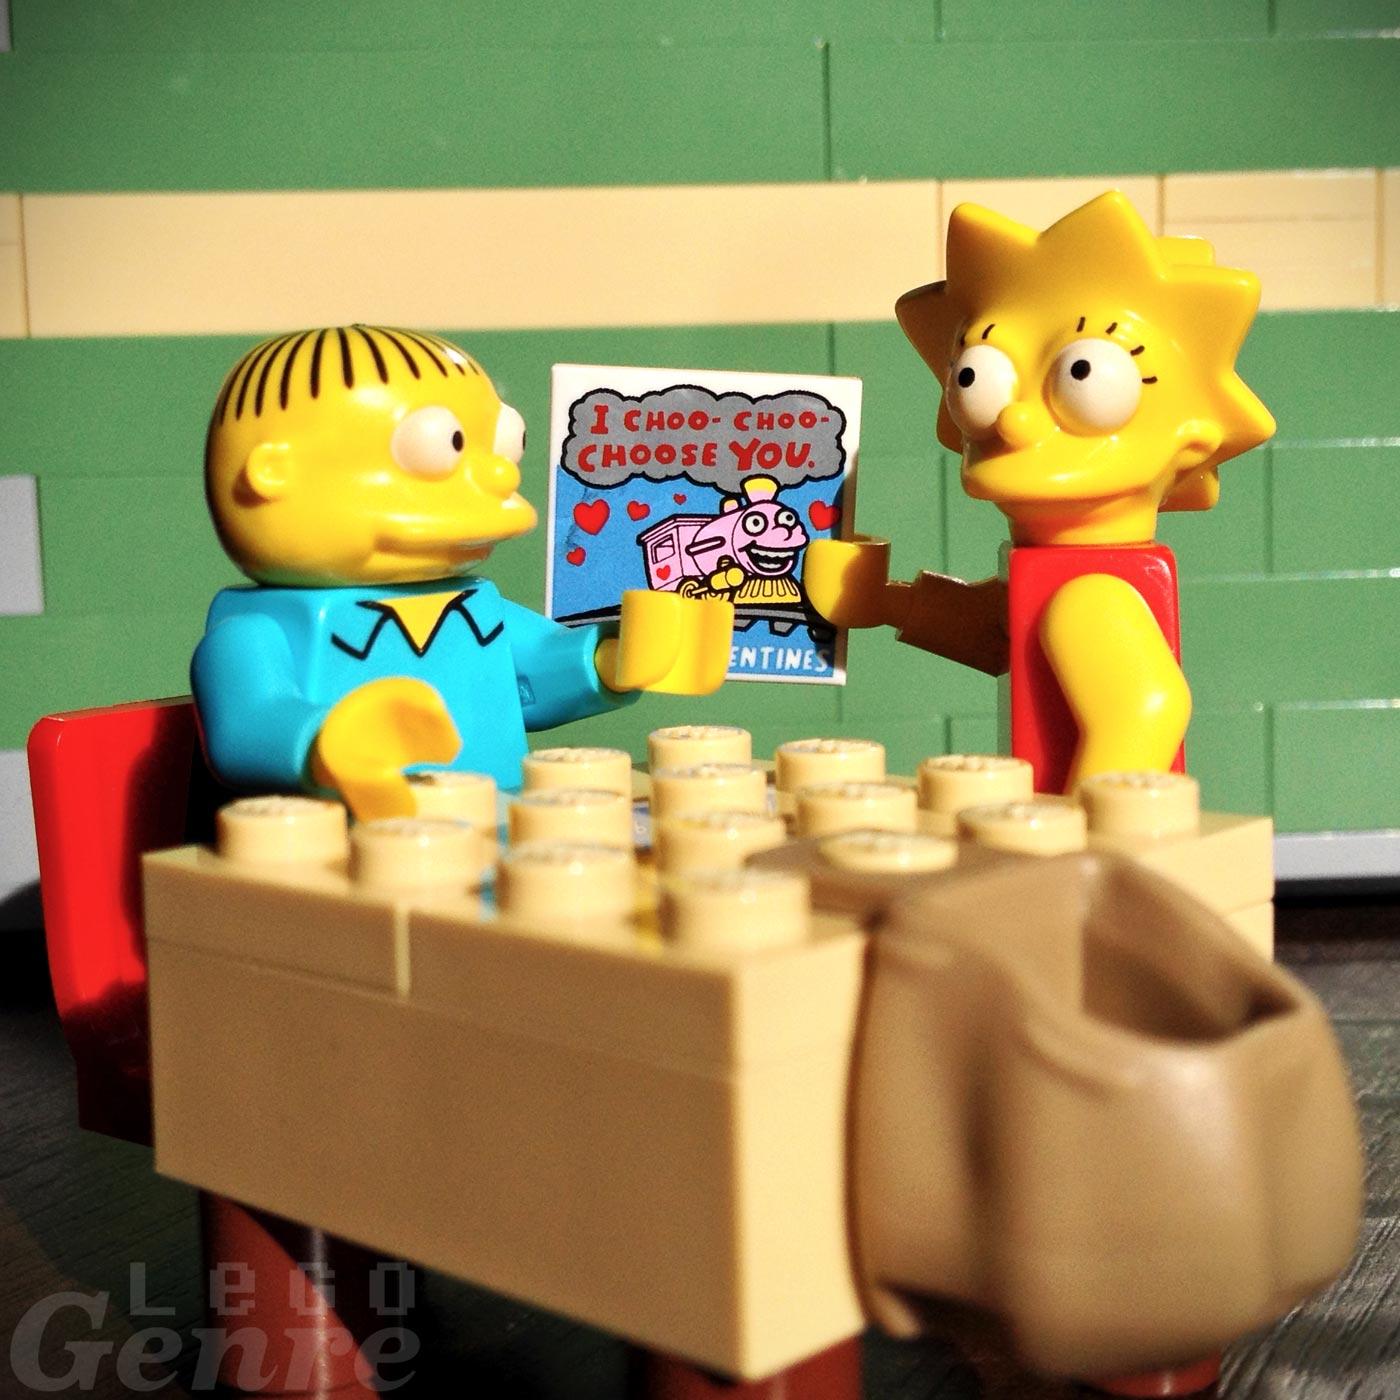 LegoGenre 0377: You Choo-Choo-Choose Me?